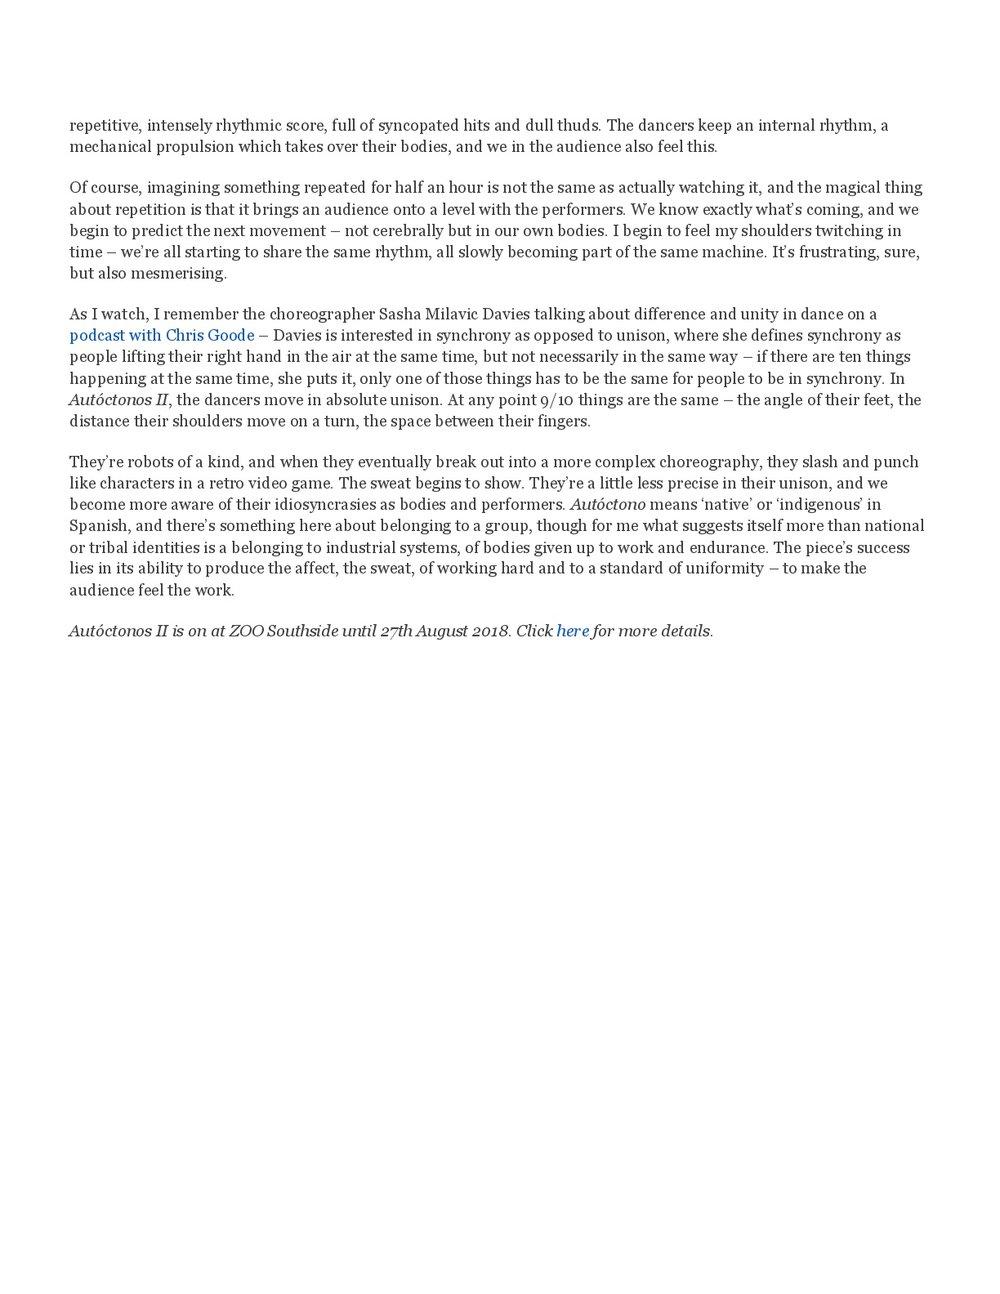 review-Exeunt-Magazine_AUT-II-002.jpg